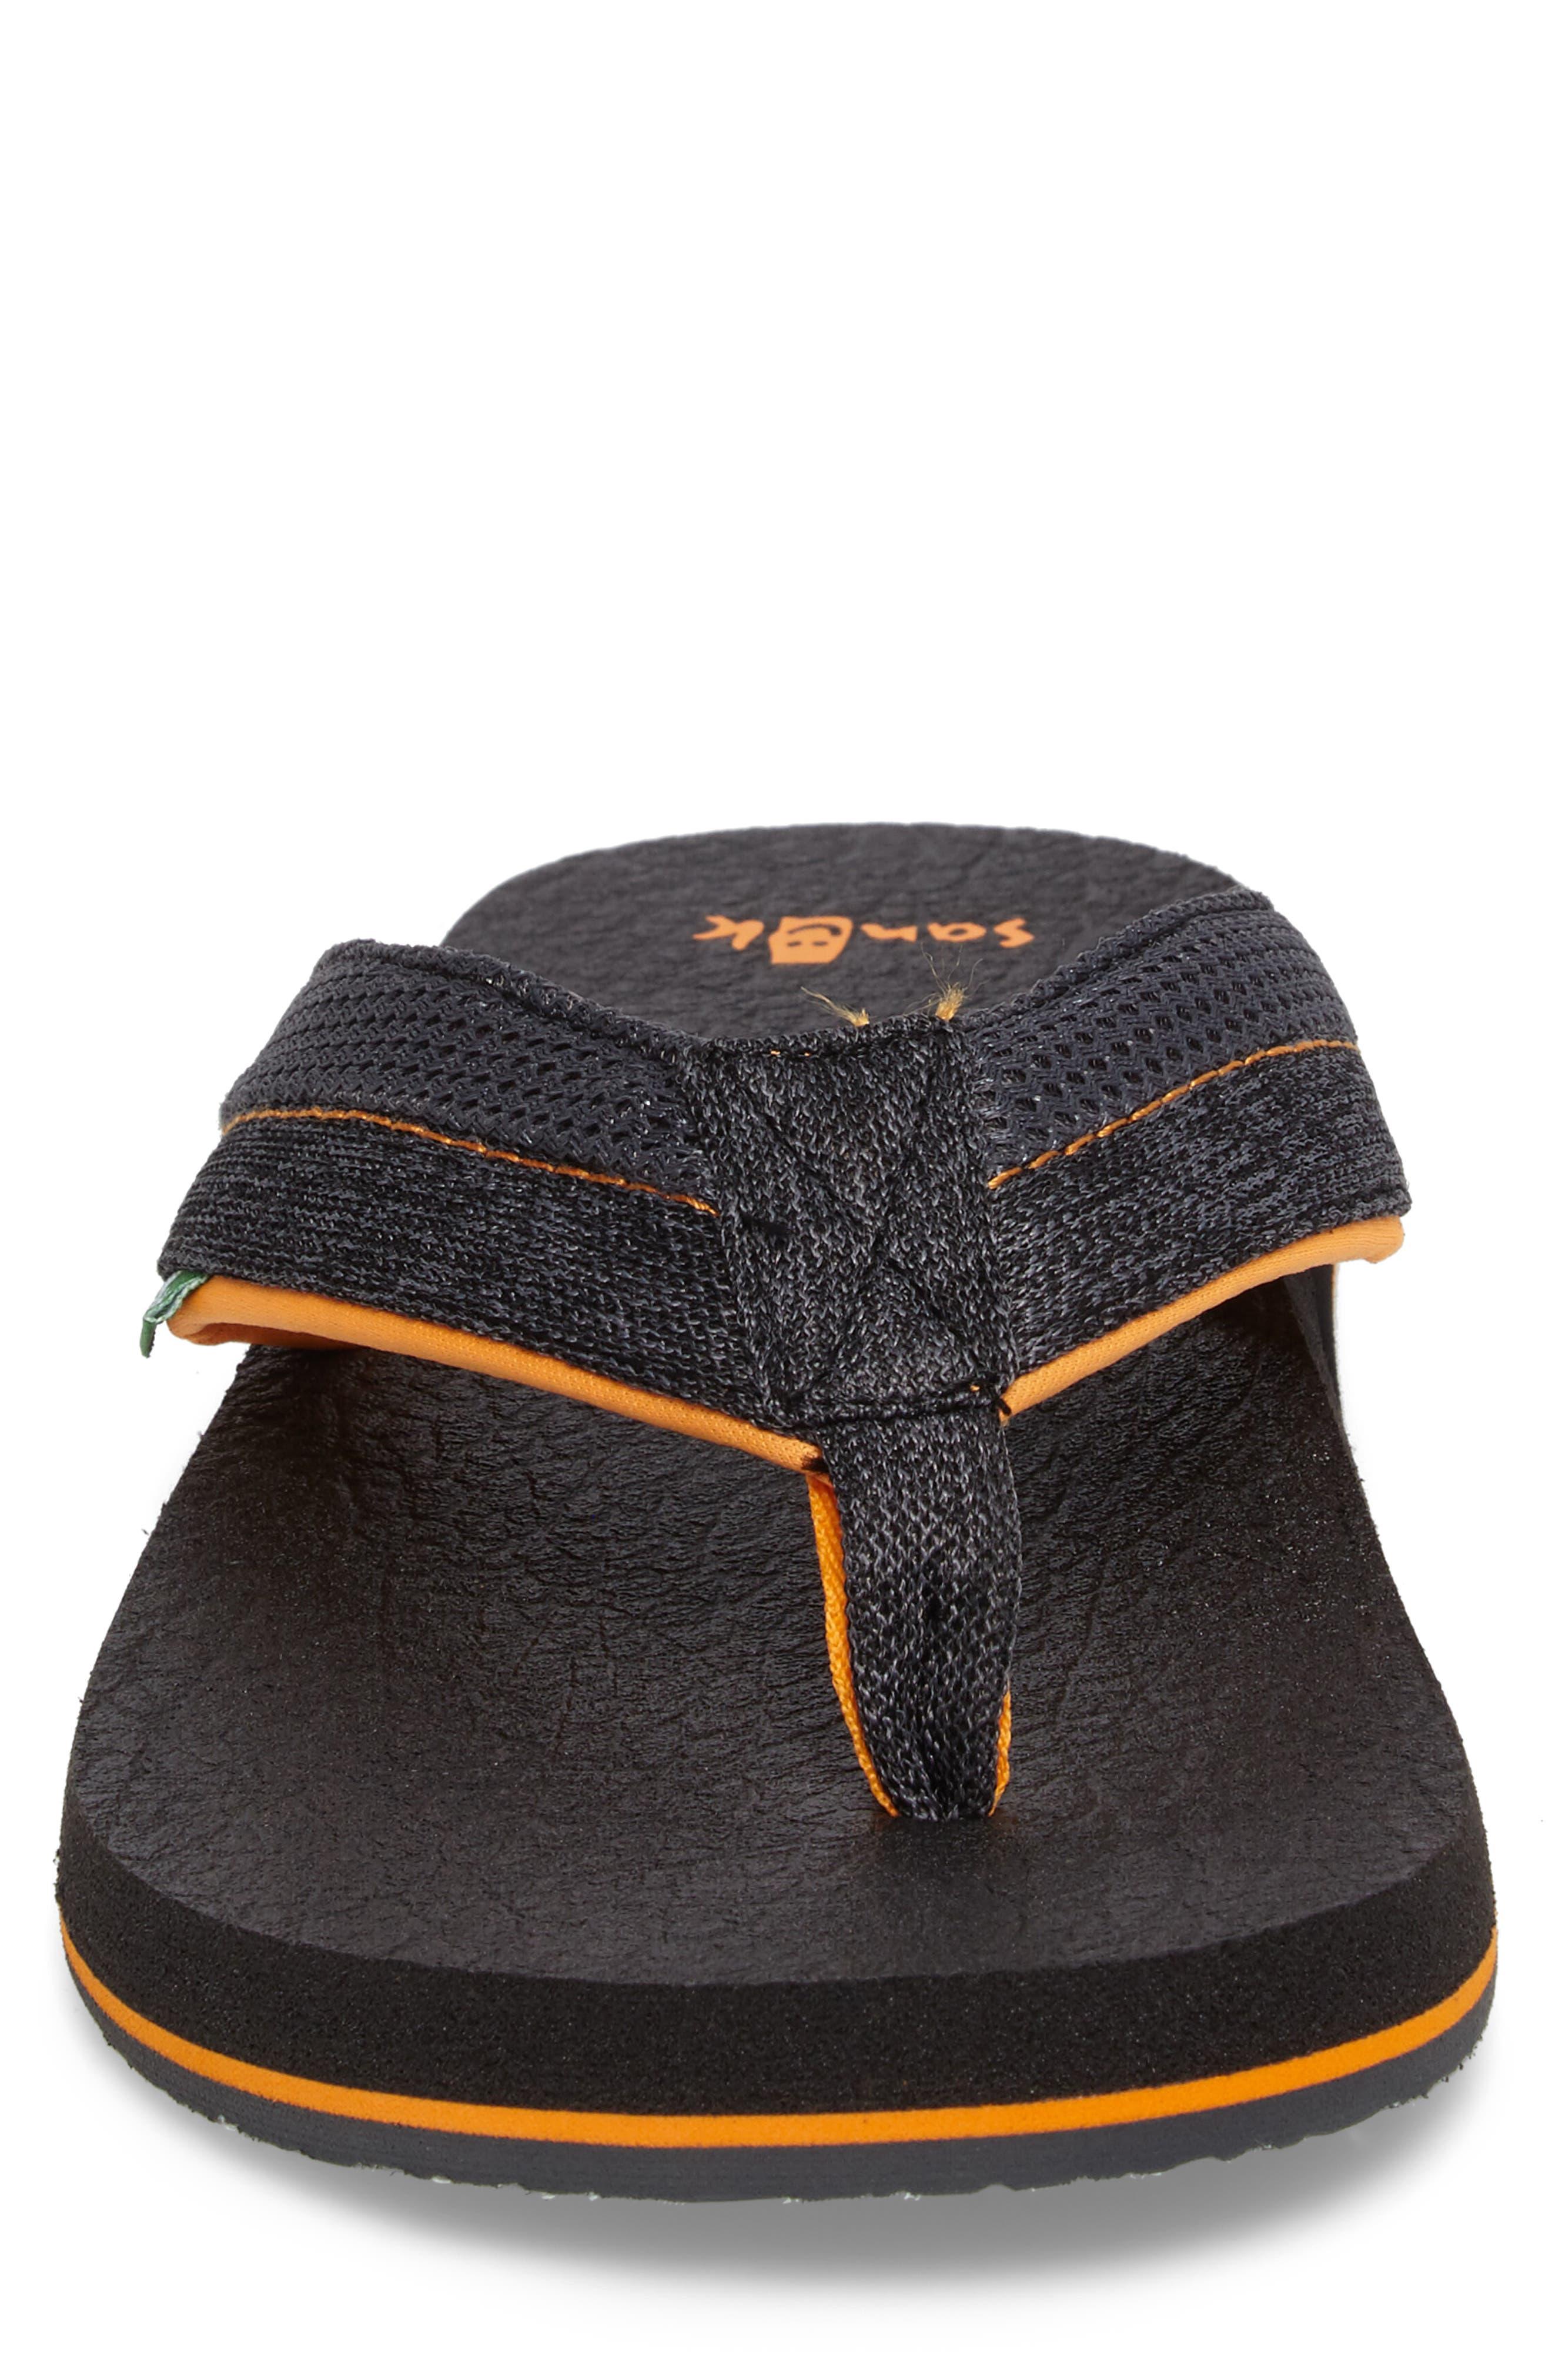 Beer Cozy Flip Flop,                             Alternate thumbnail 4, color,                             Black/ Charcoal/ Orange